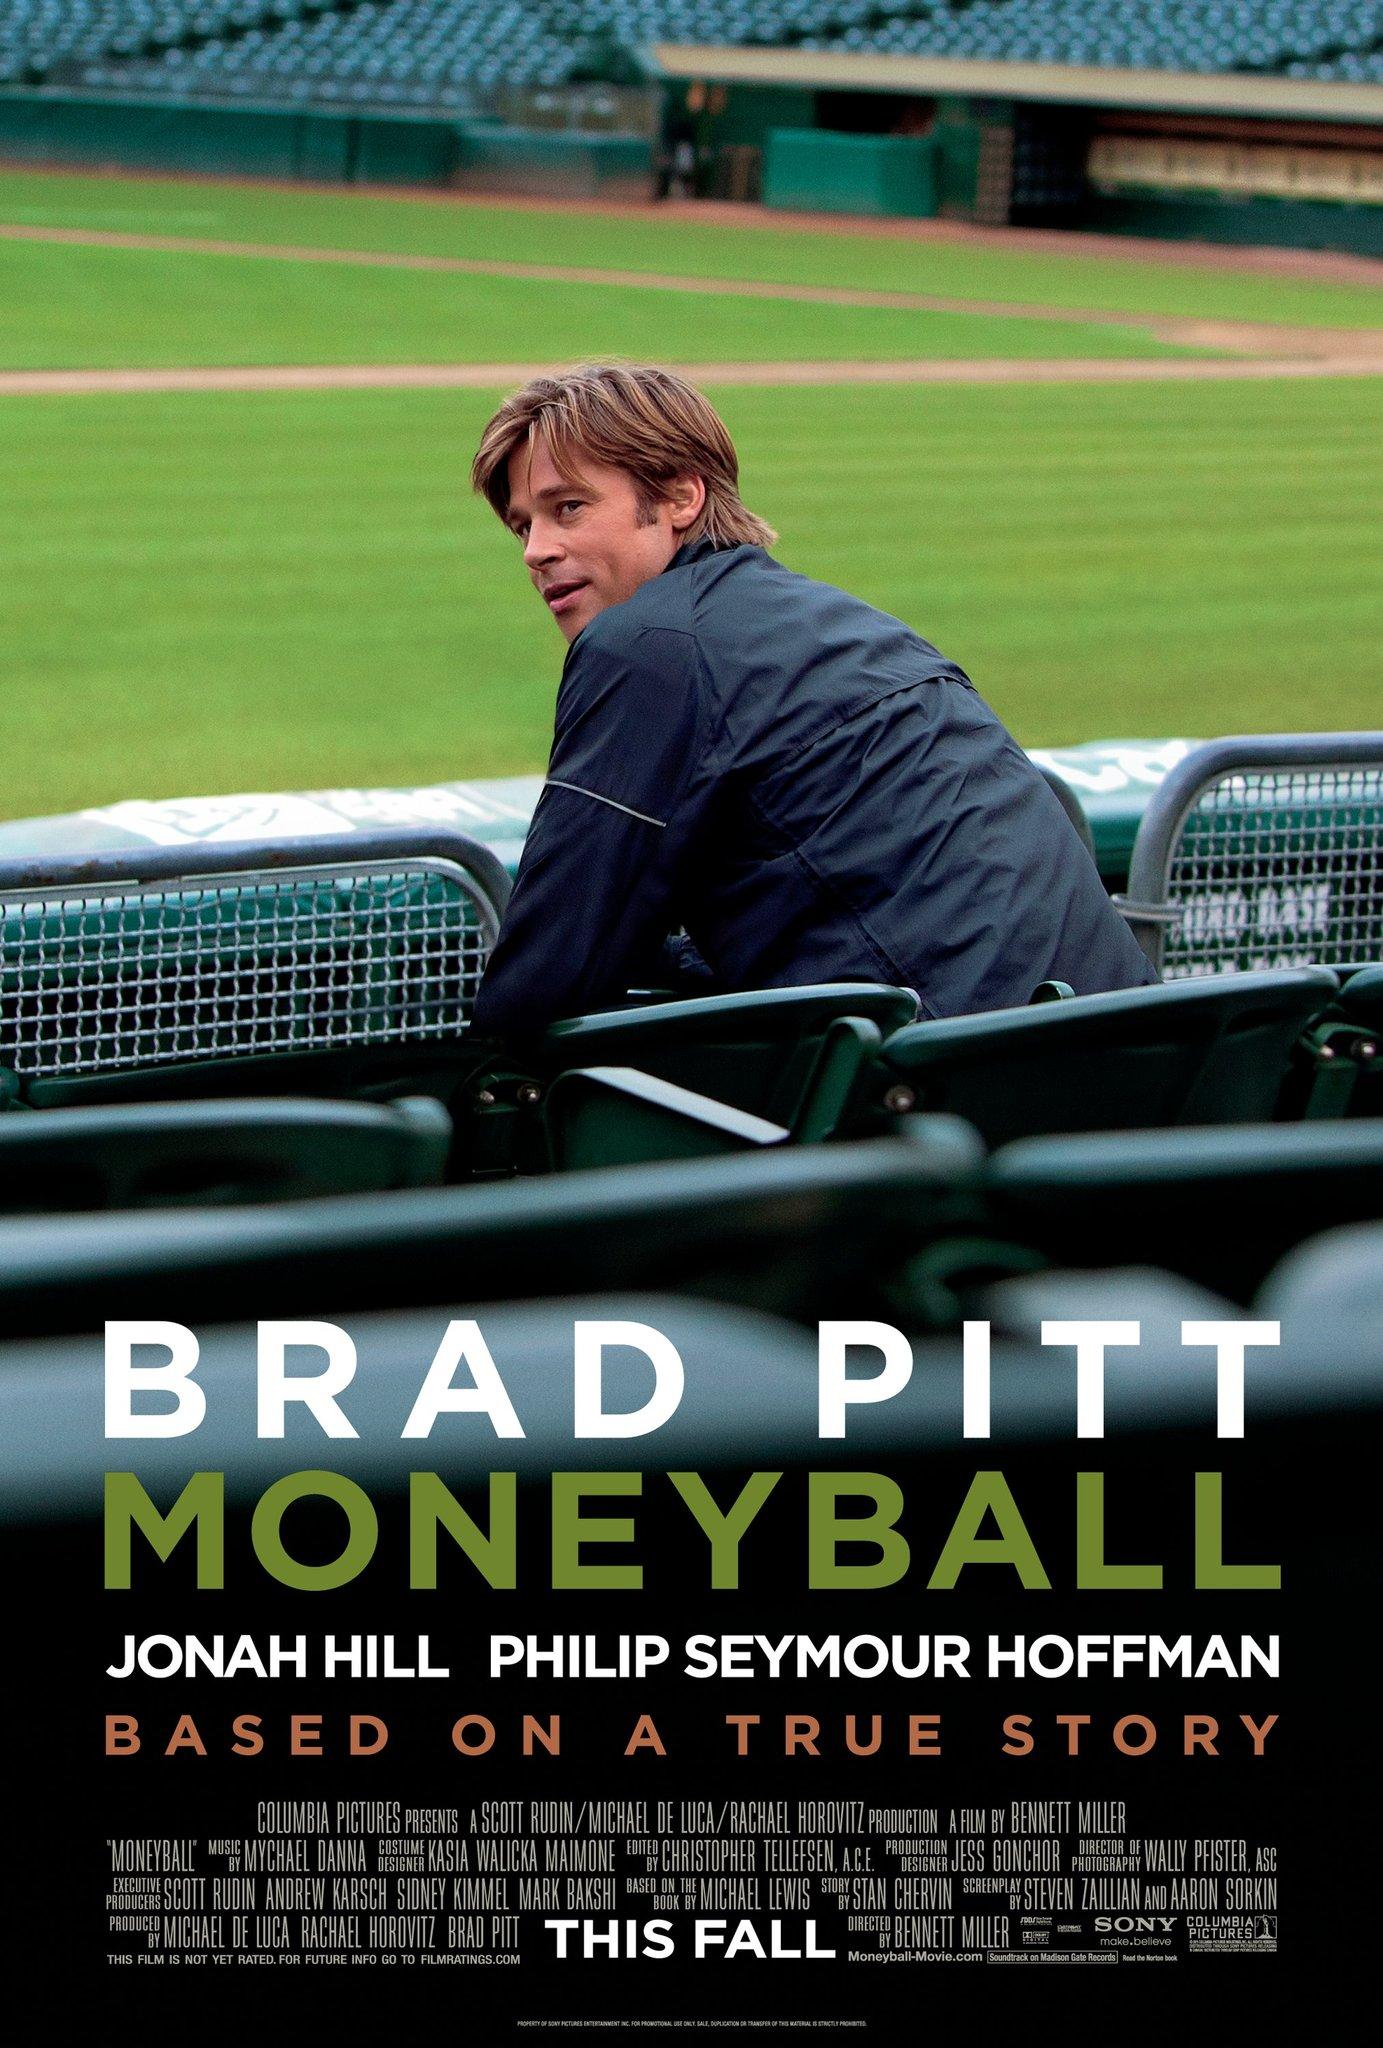 Moneyball poster with Brad Pitt sitting in an empty baseball stadium